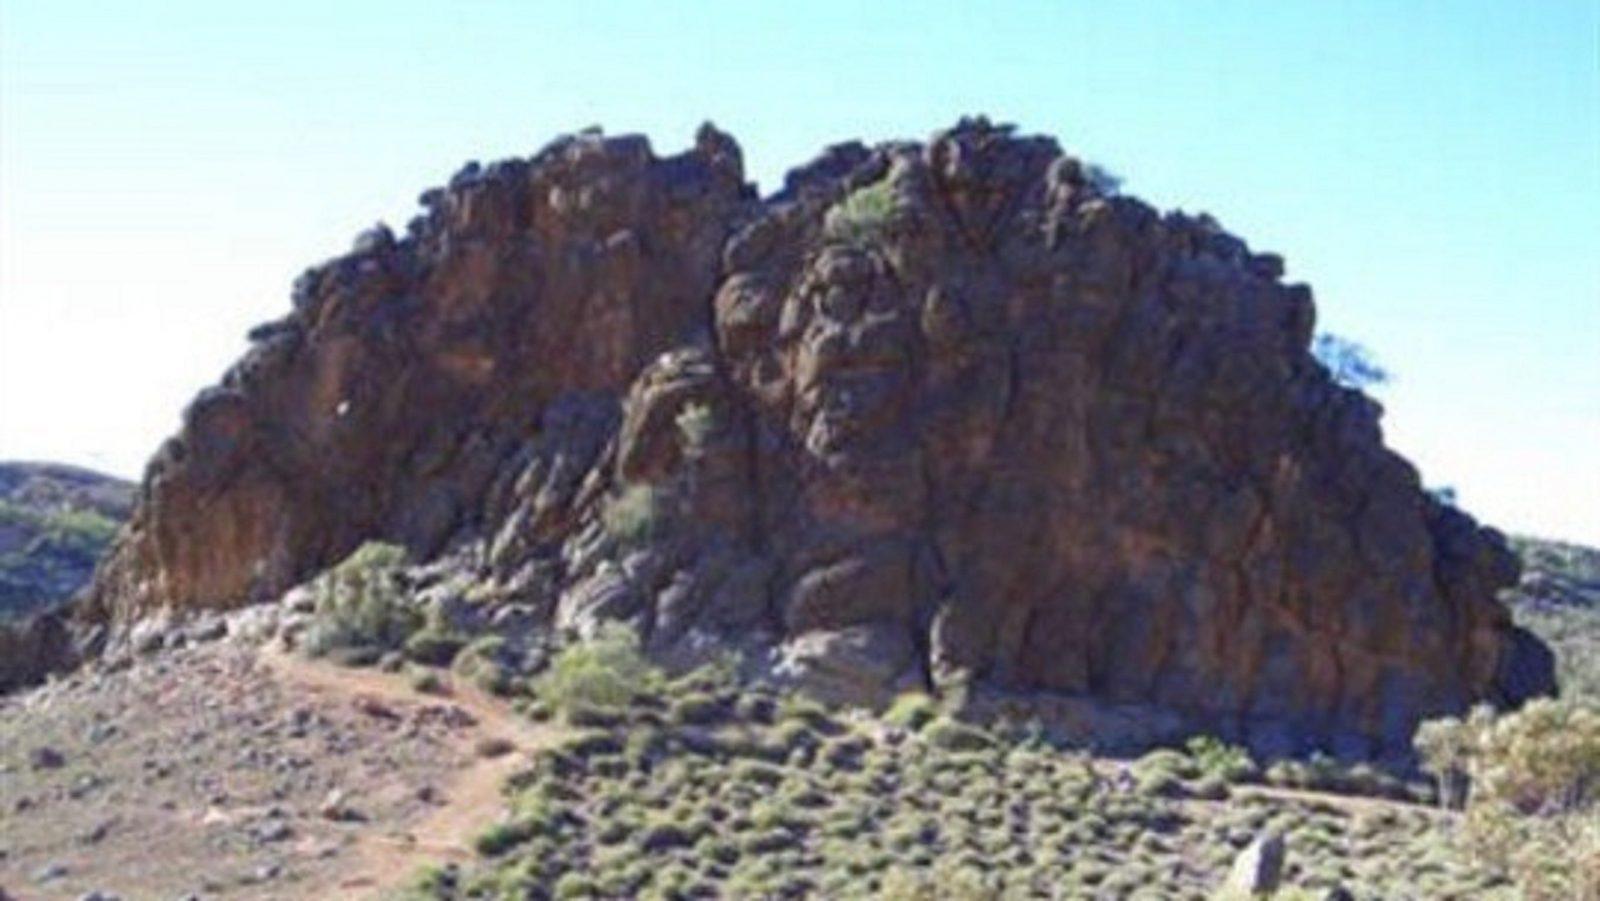 Corroboree Rock Conservation Reserve